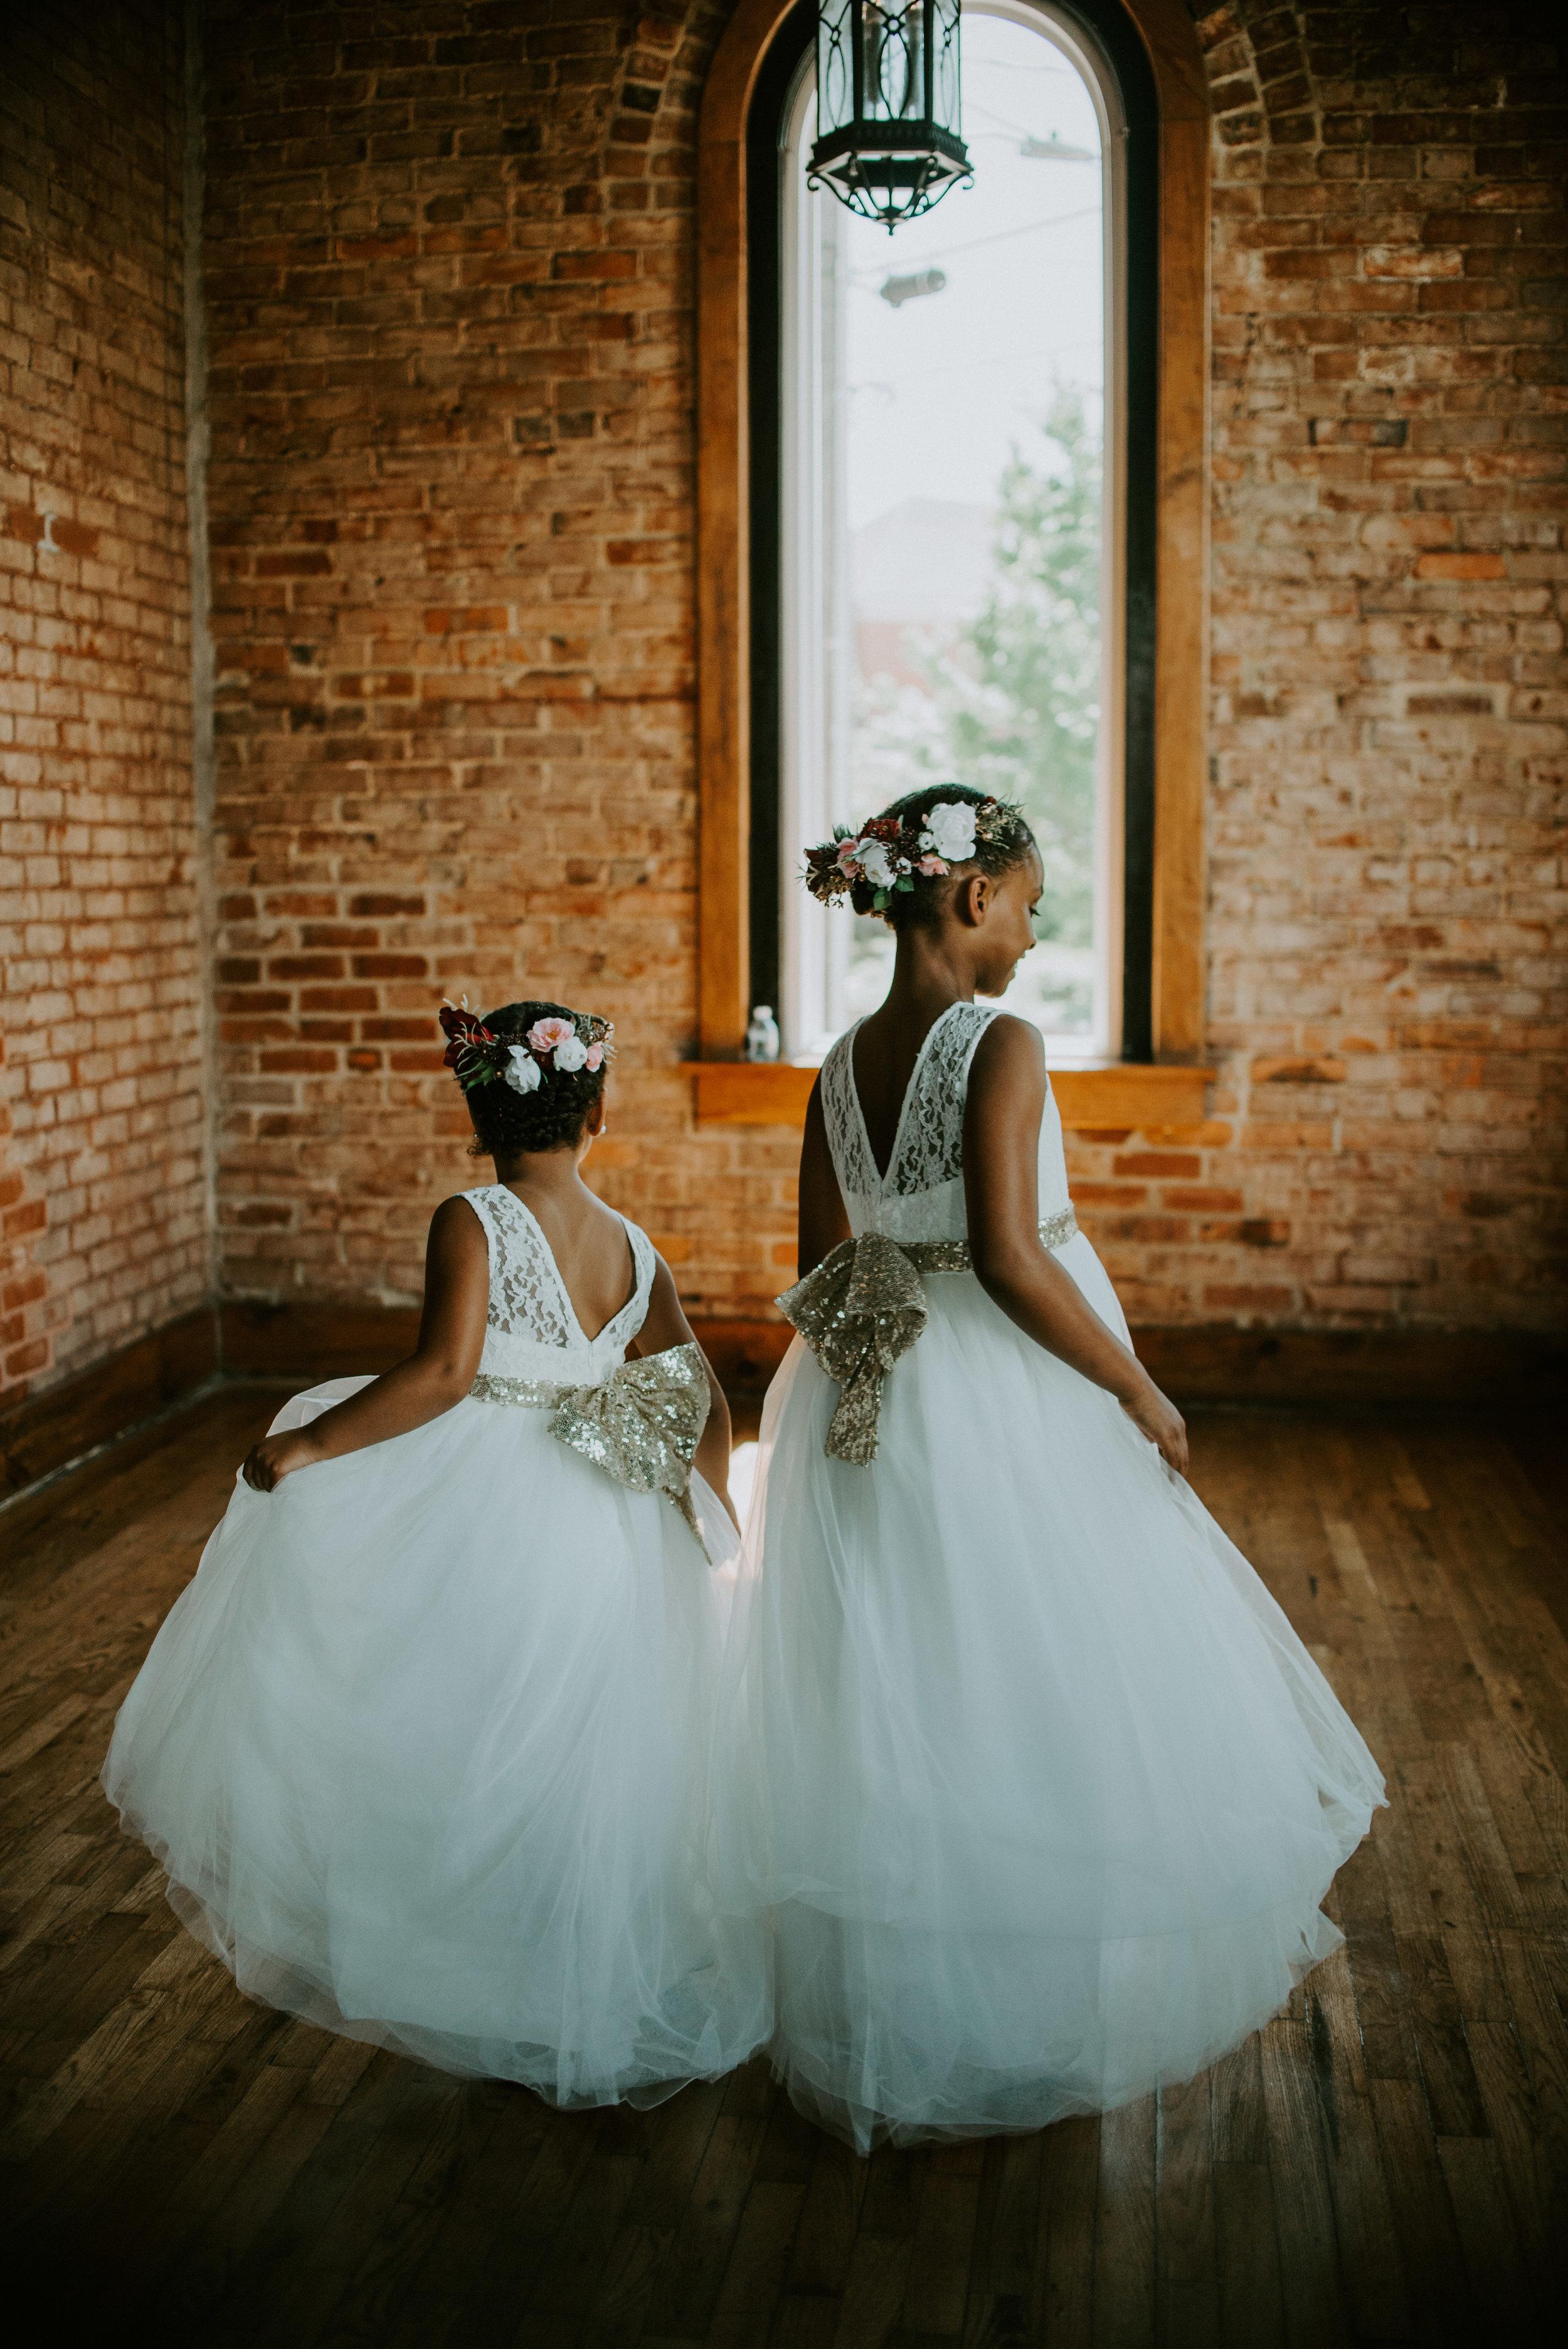 WonderlyCreative_Wedding_6.7.18_Khara&Dwayne_-381.jpg